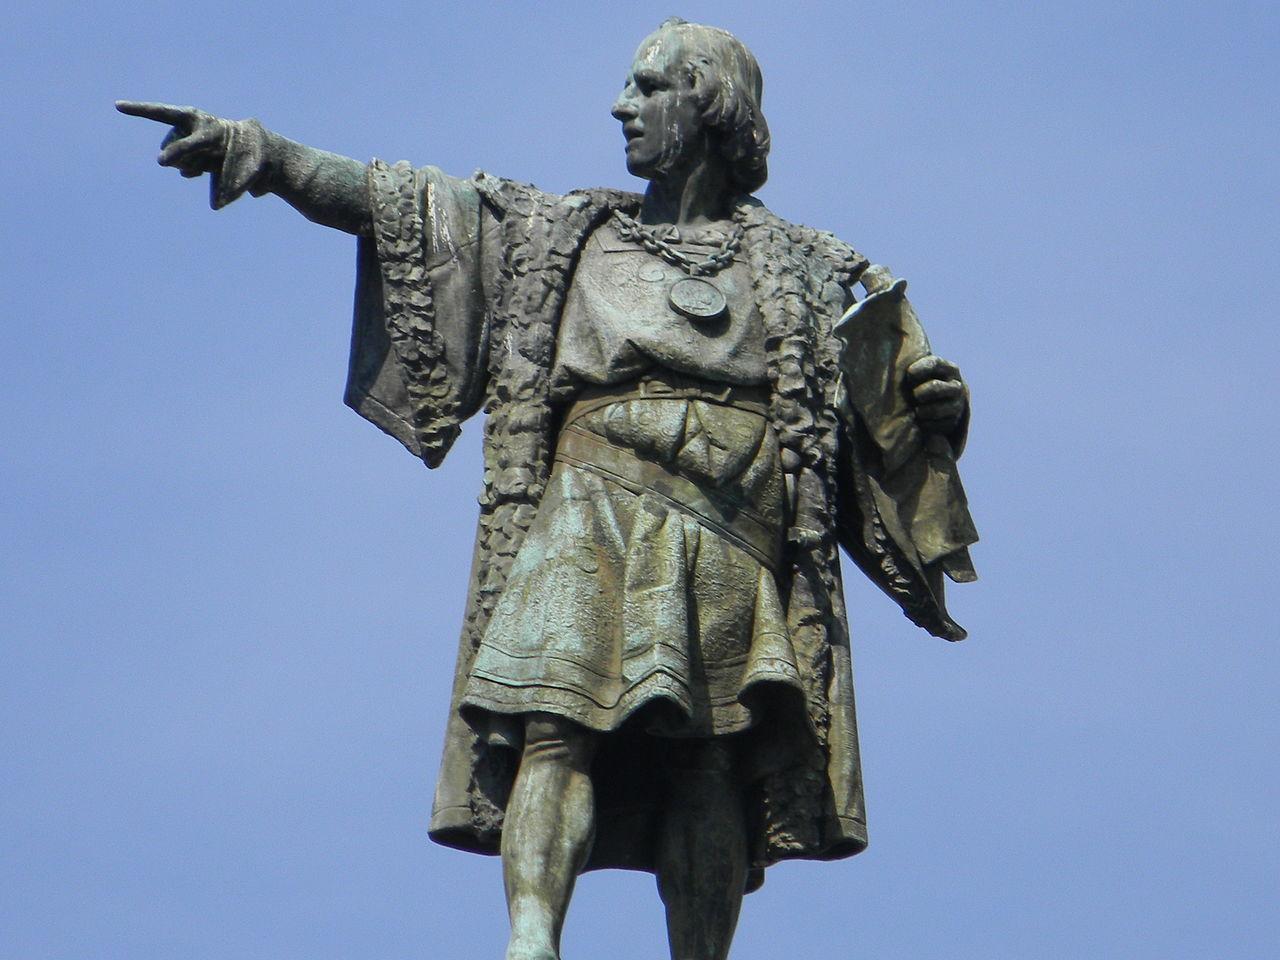 Монумент Колумбу в Барселоне, верхняя часть